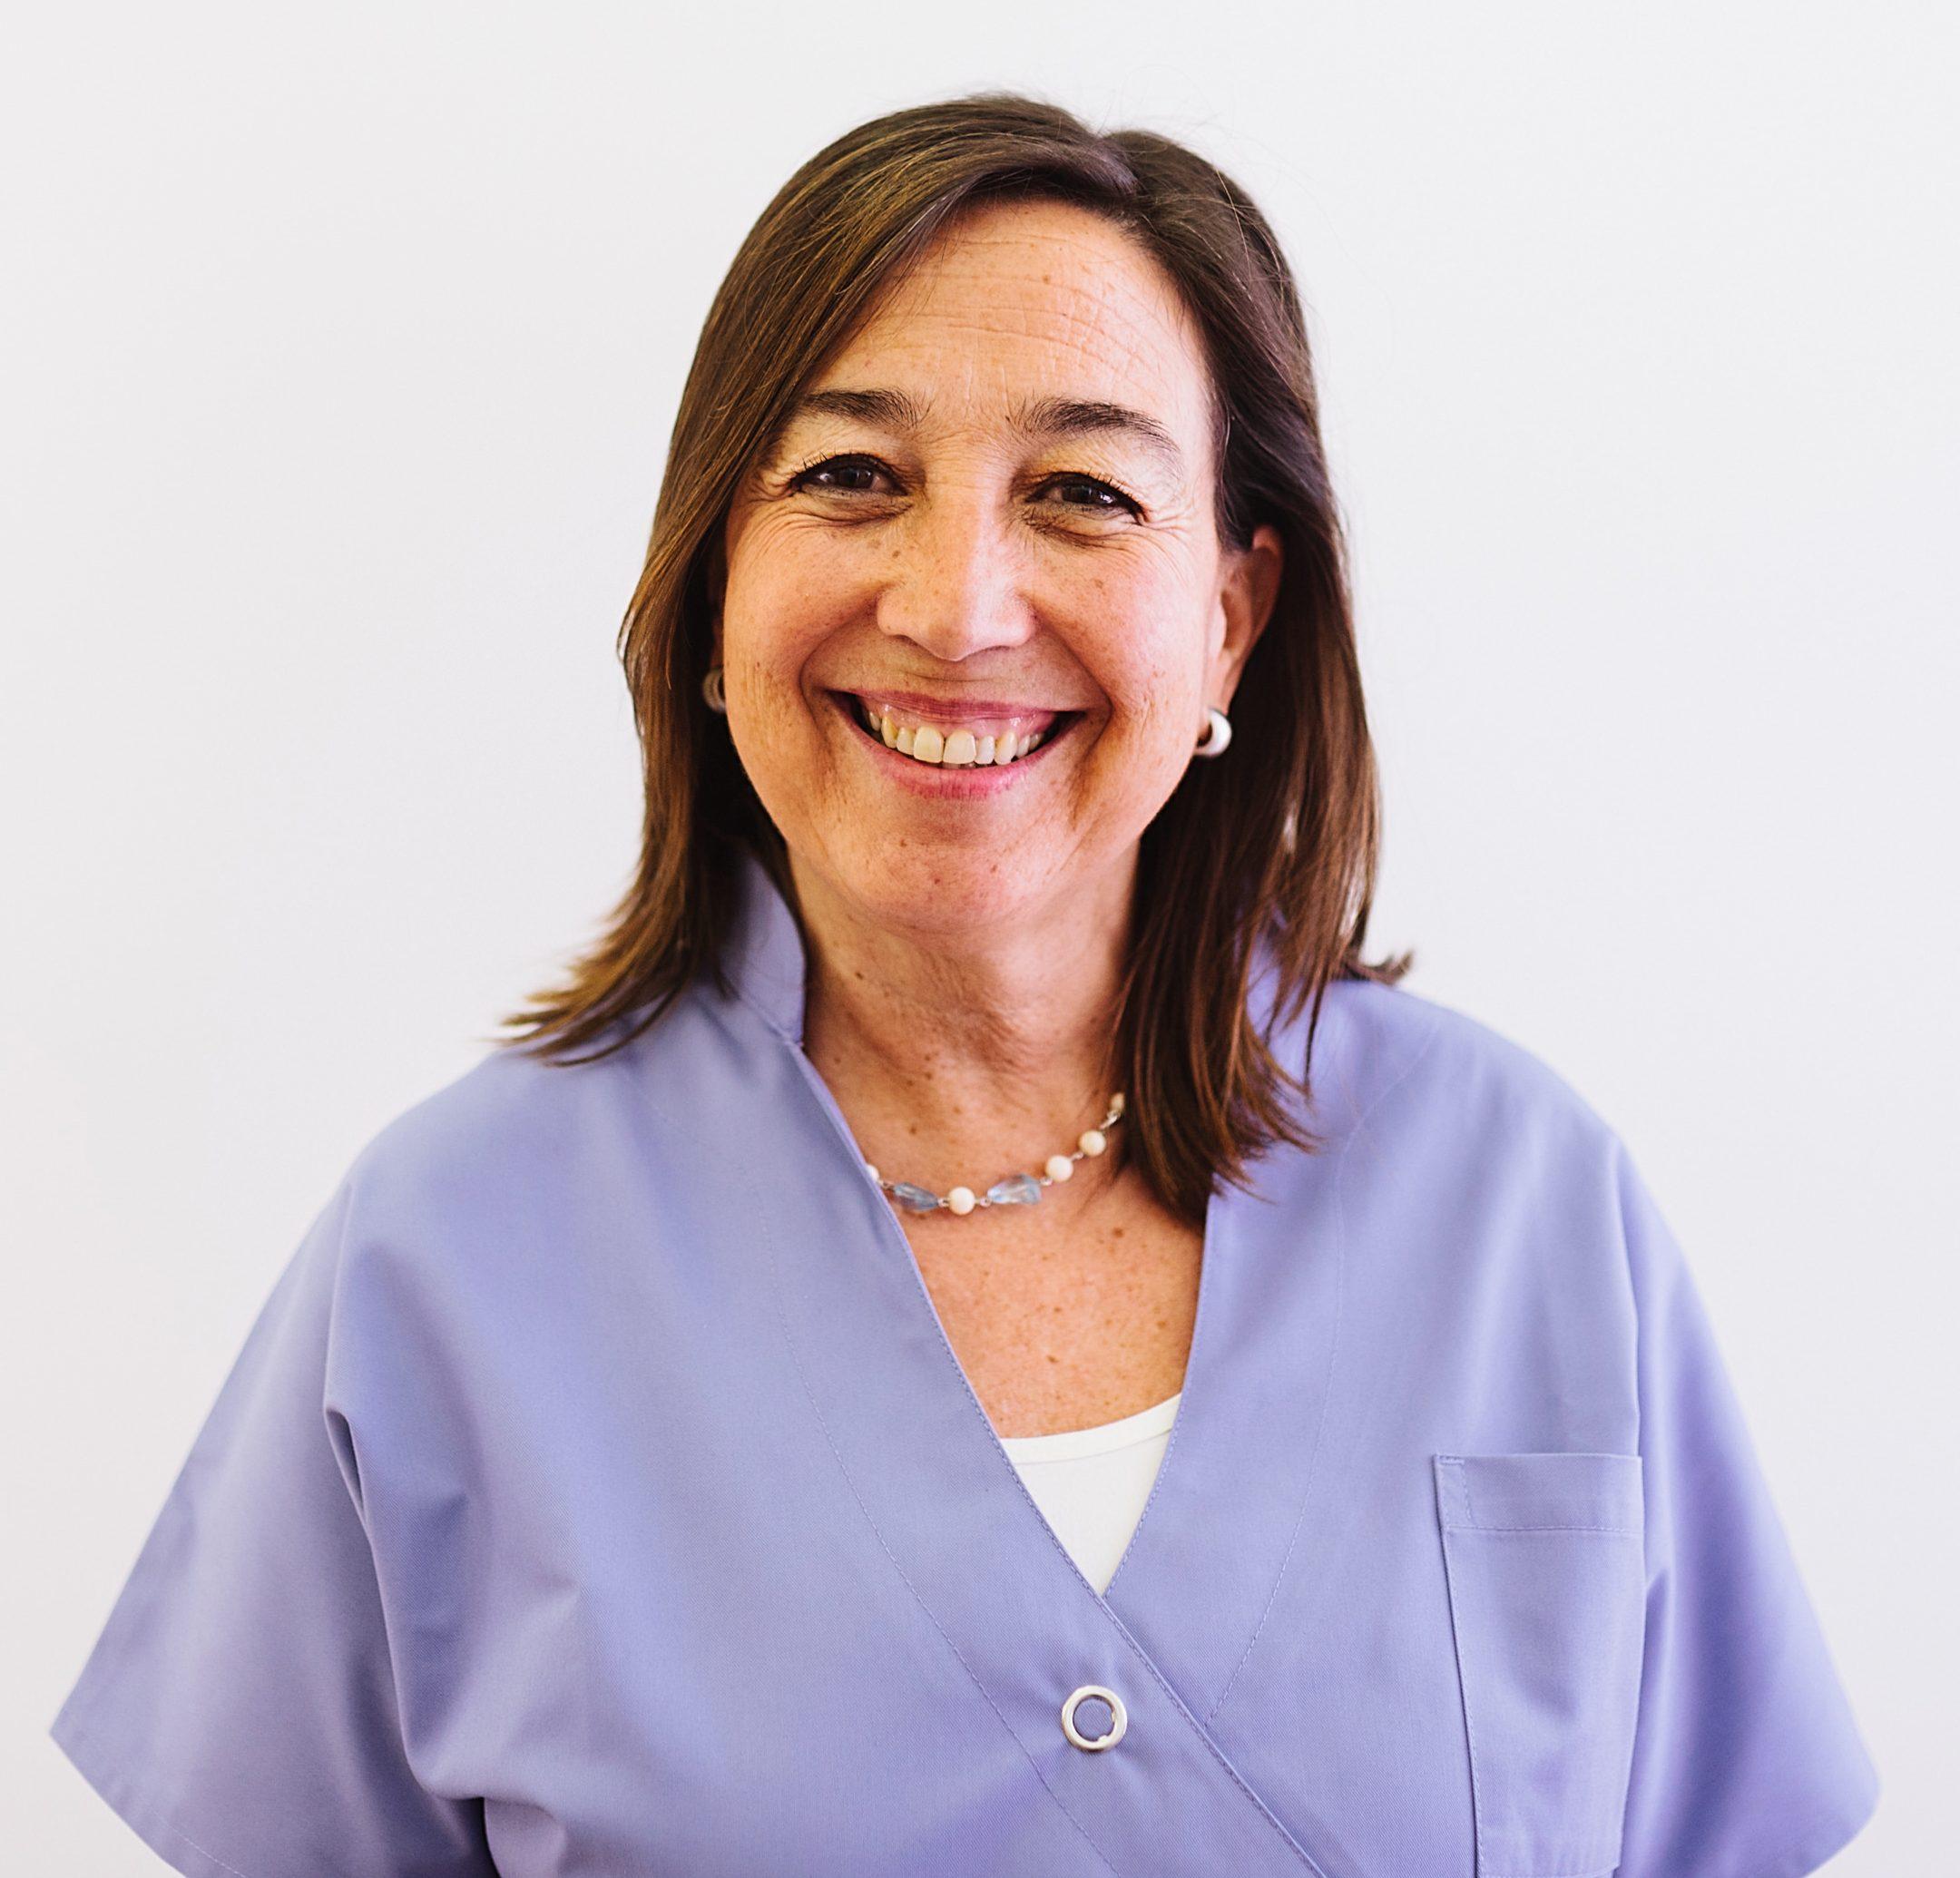 Dra. Carmen López